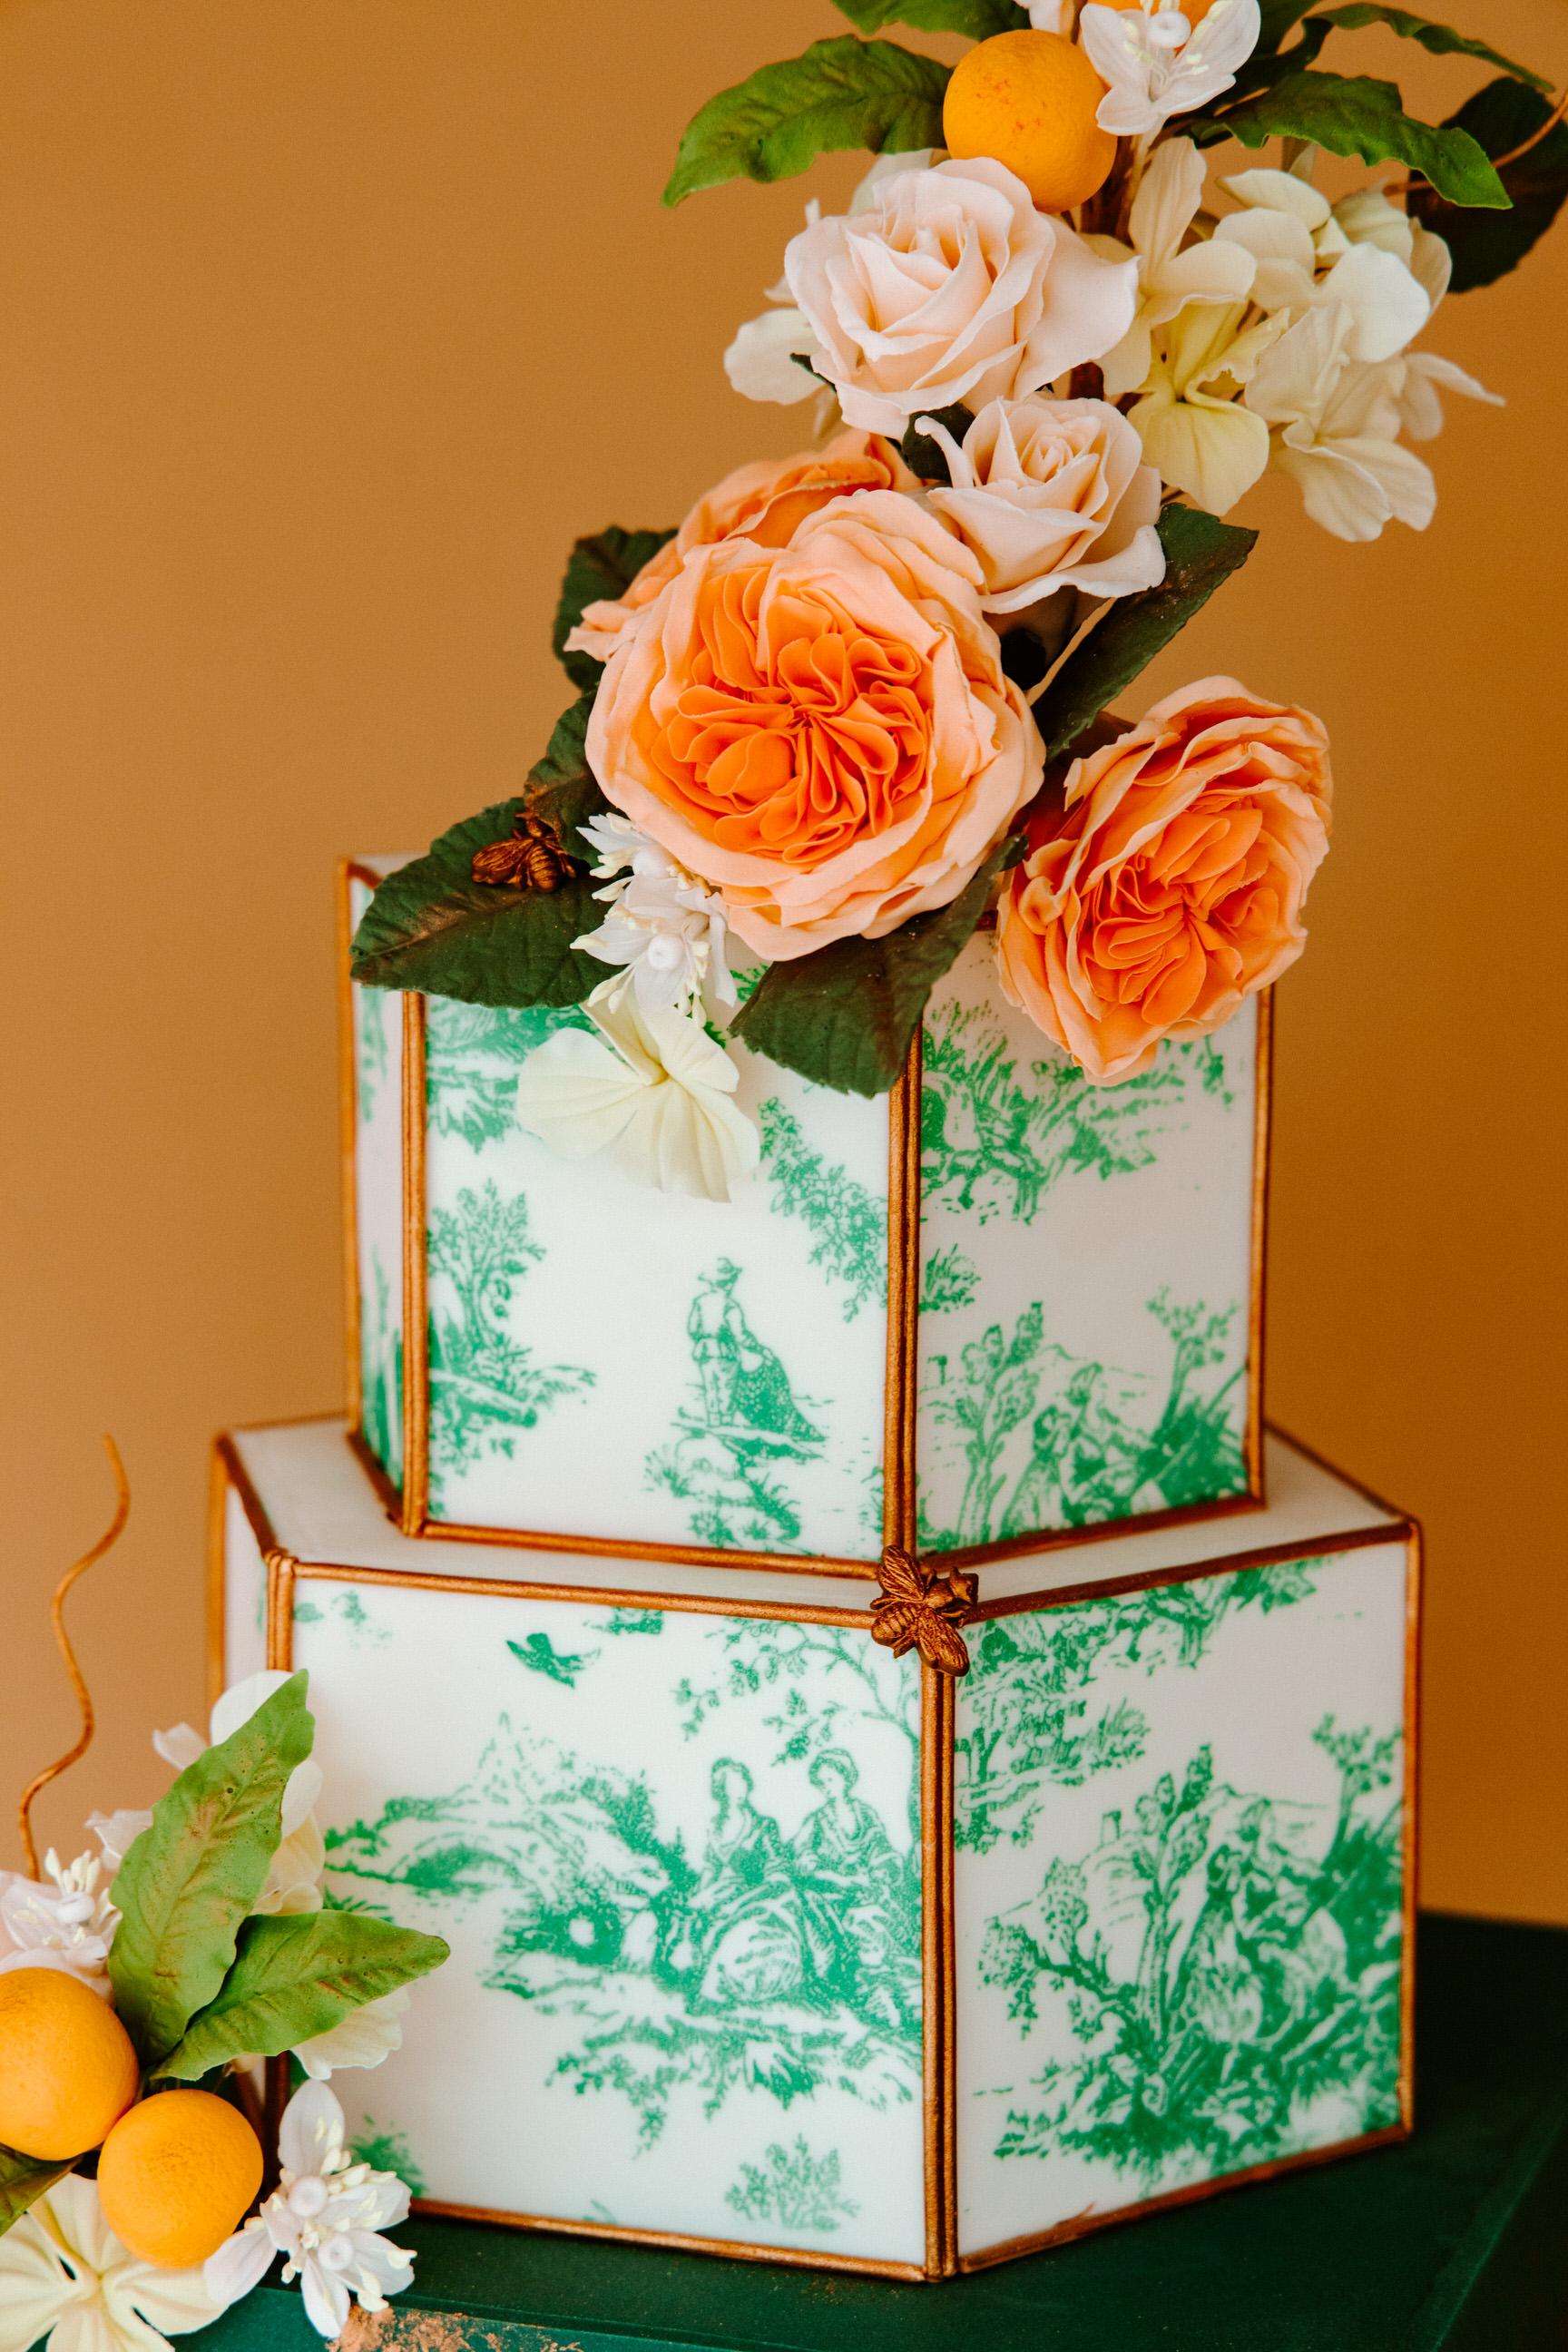 gateaux-cake-7441.jpg